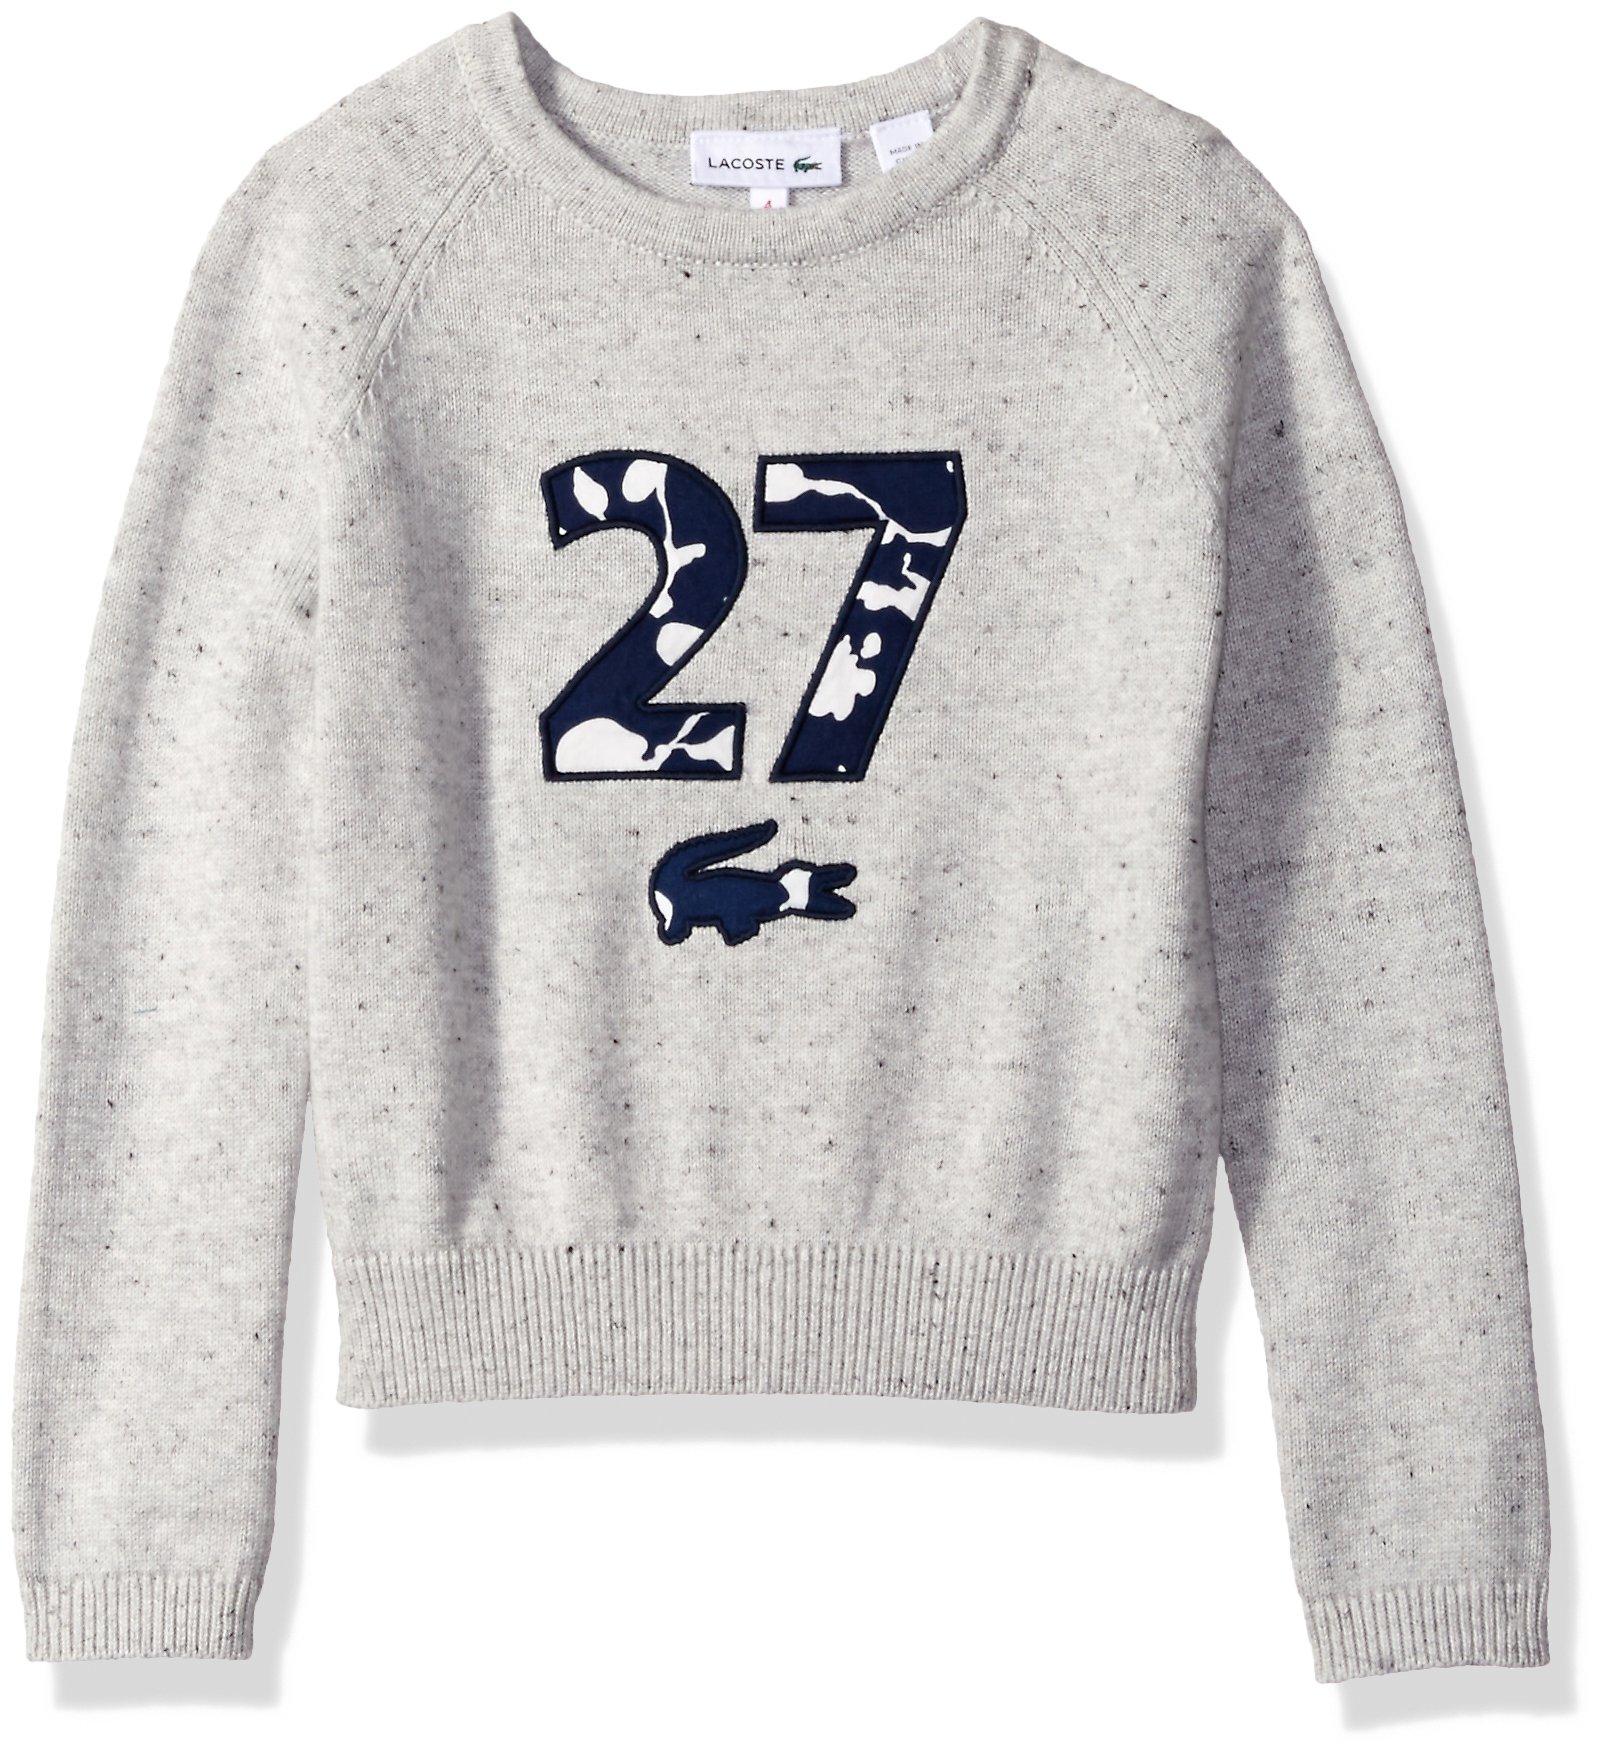 Lacoste Girls' Big Girls' Long Sleeve 27 Raglan Sweater, Light Tar Grey Chine, 12A